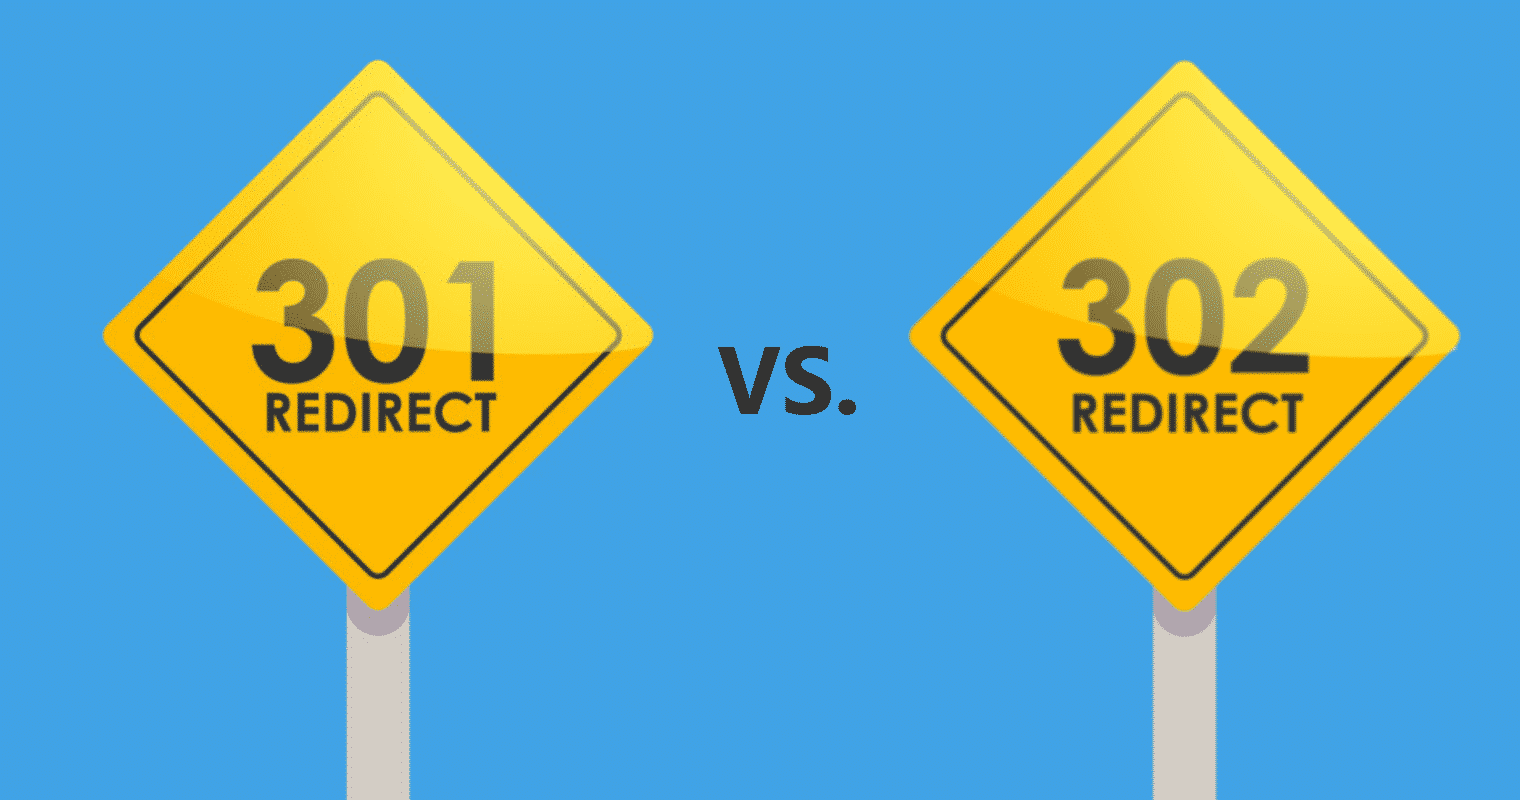 301 vs 302 Redirects